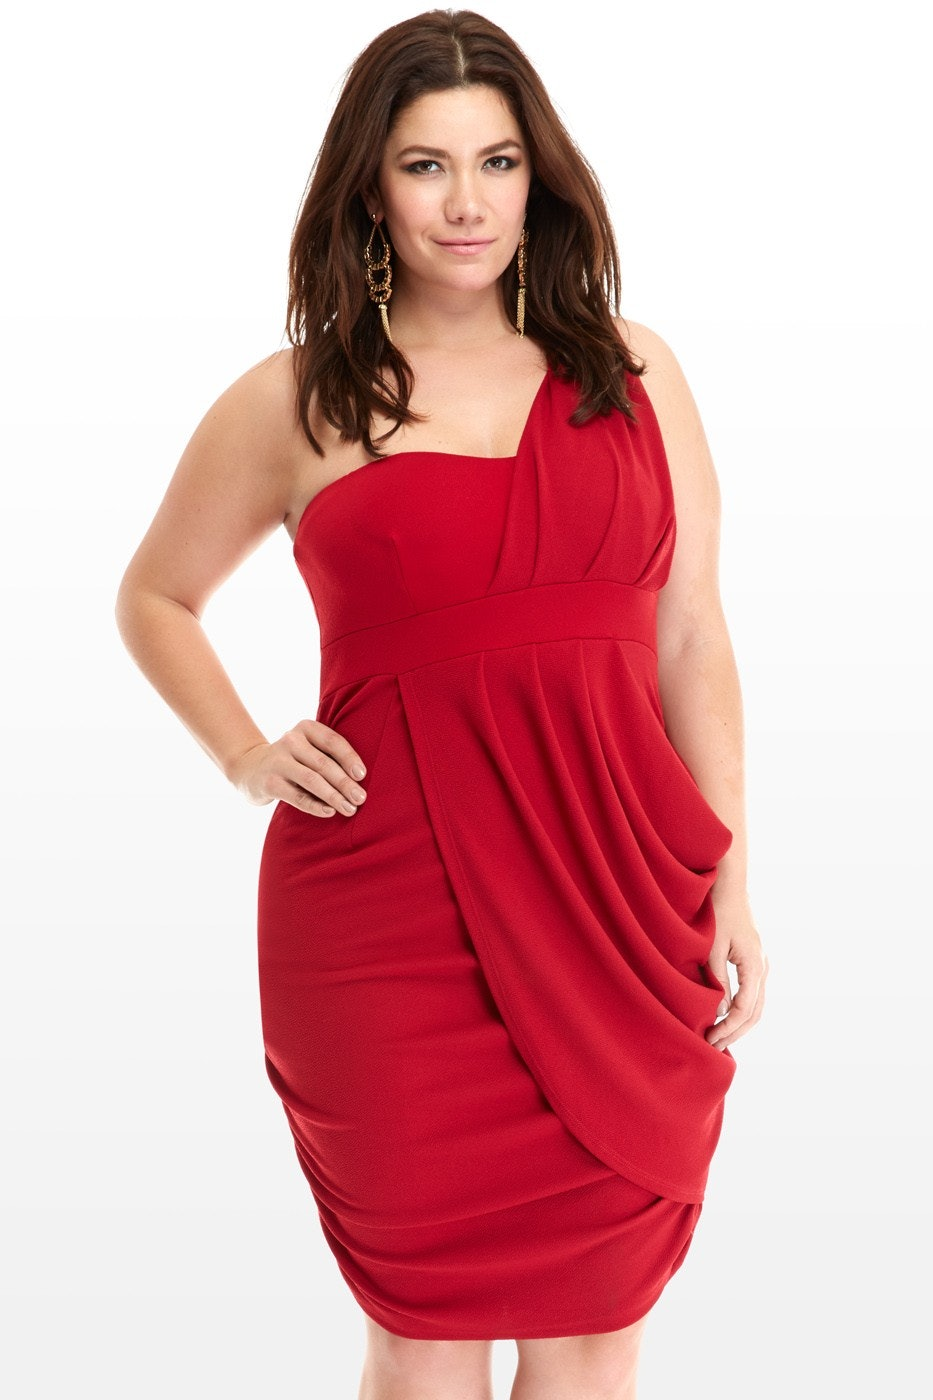 Womens Plus Size Clothing Fashion 16